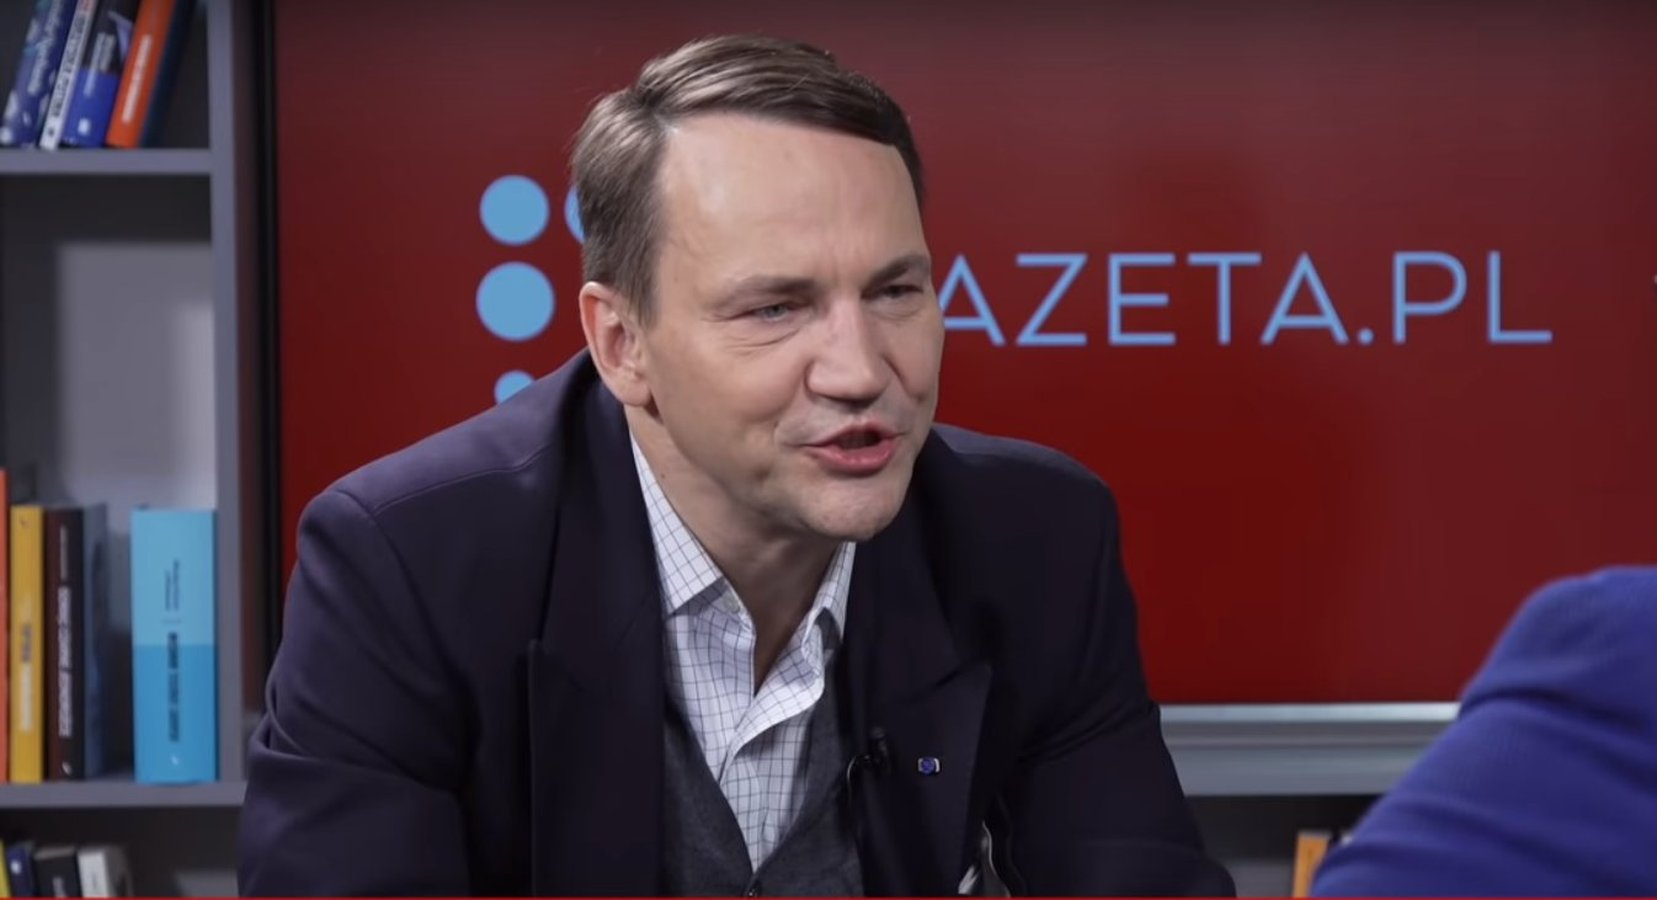 propolski.pl: Sikorski zaatakował prezesa TVP: